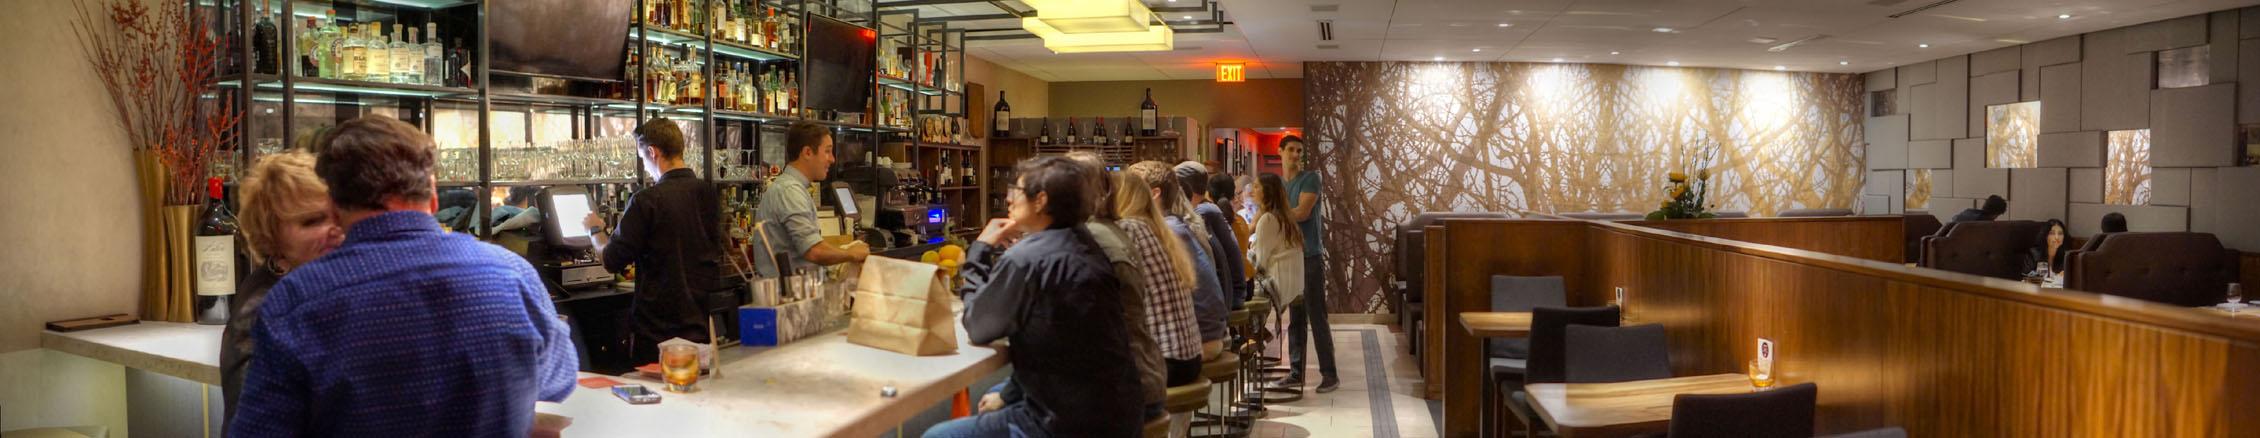 Chianina Steakhouse Interior